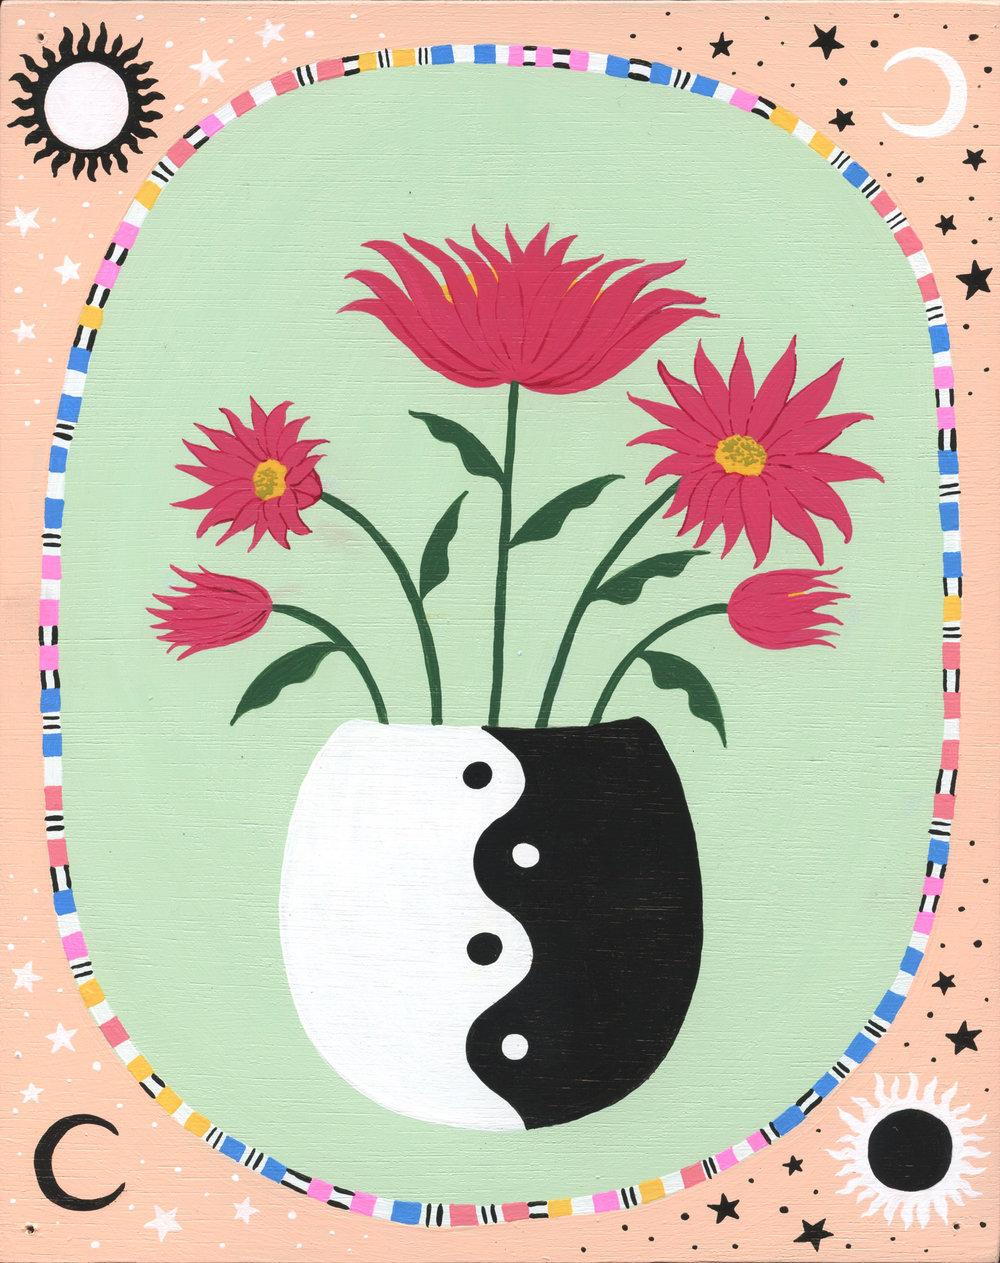 flowers for illumination